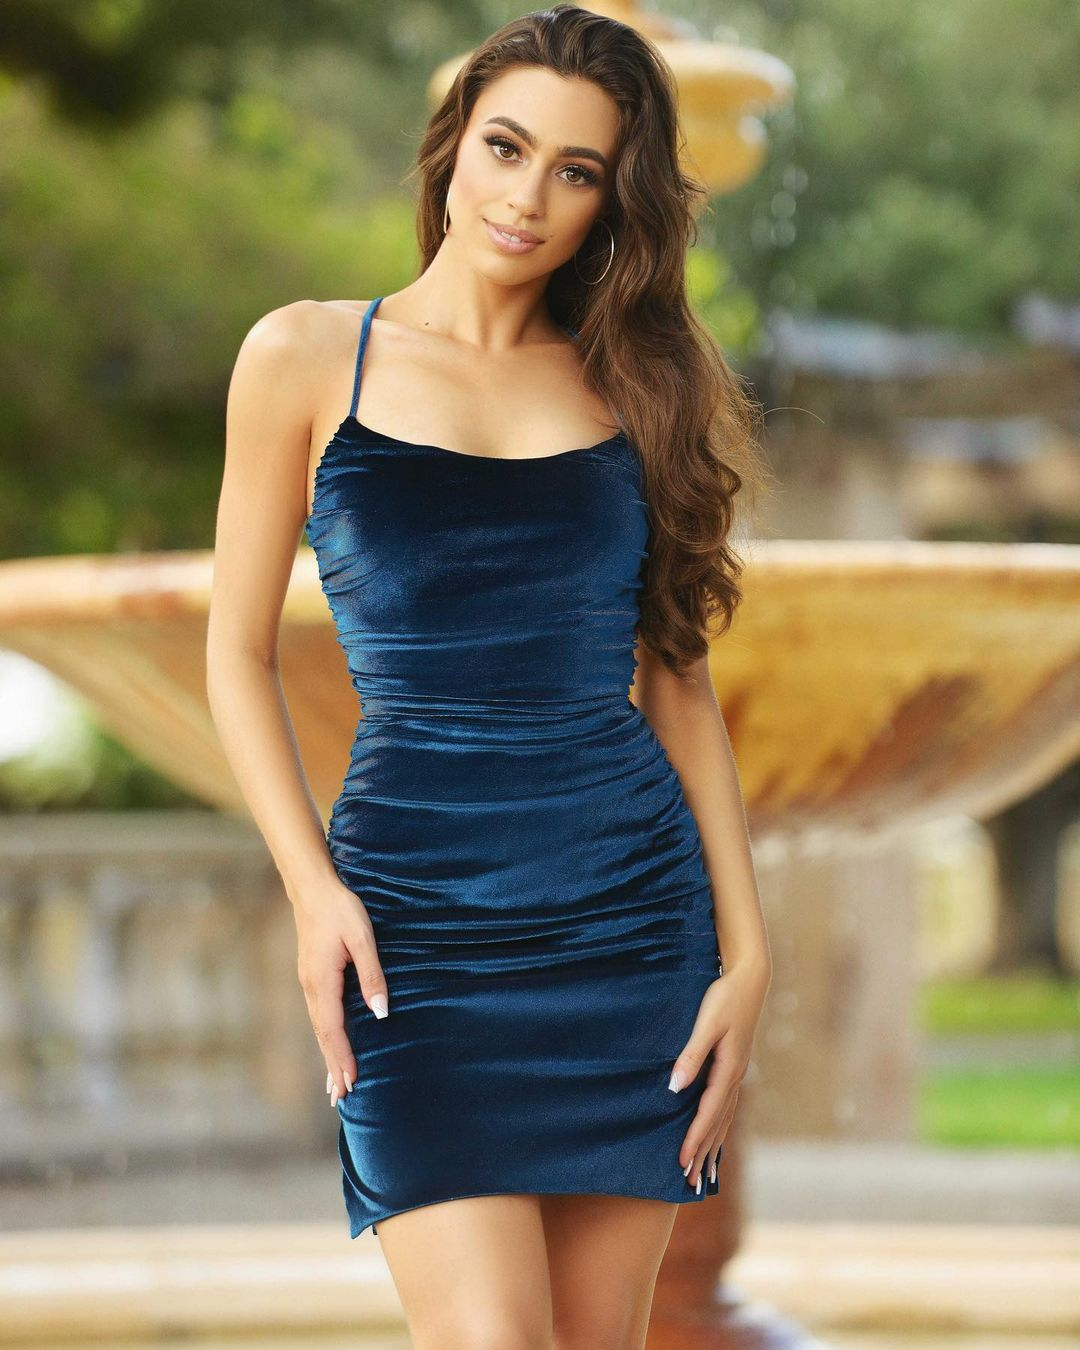 ladyblacktie 238718307 1276578182770863 8232963401966745524 n Alternatives to the LBD (Little Black Dress)